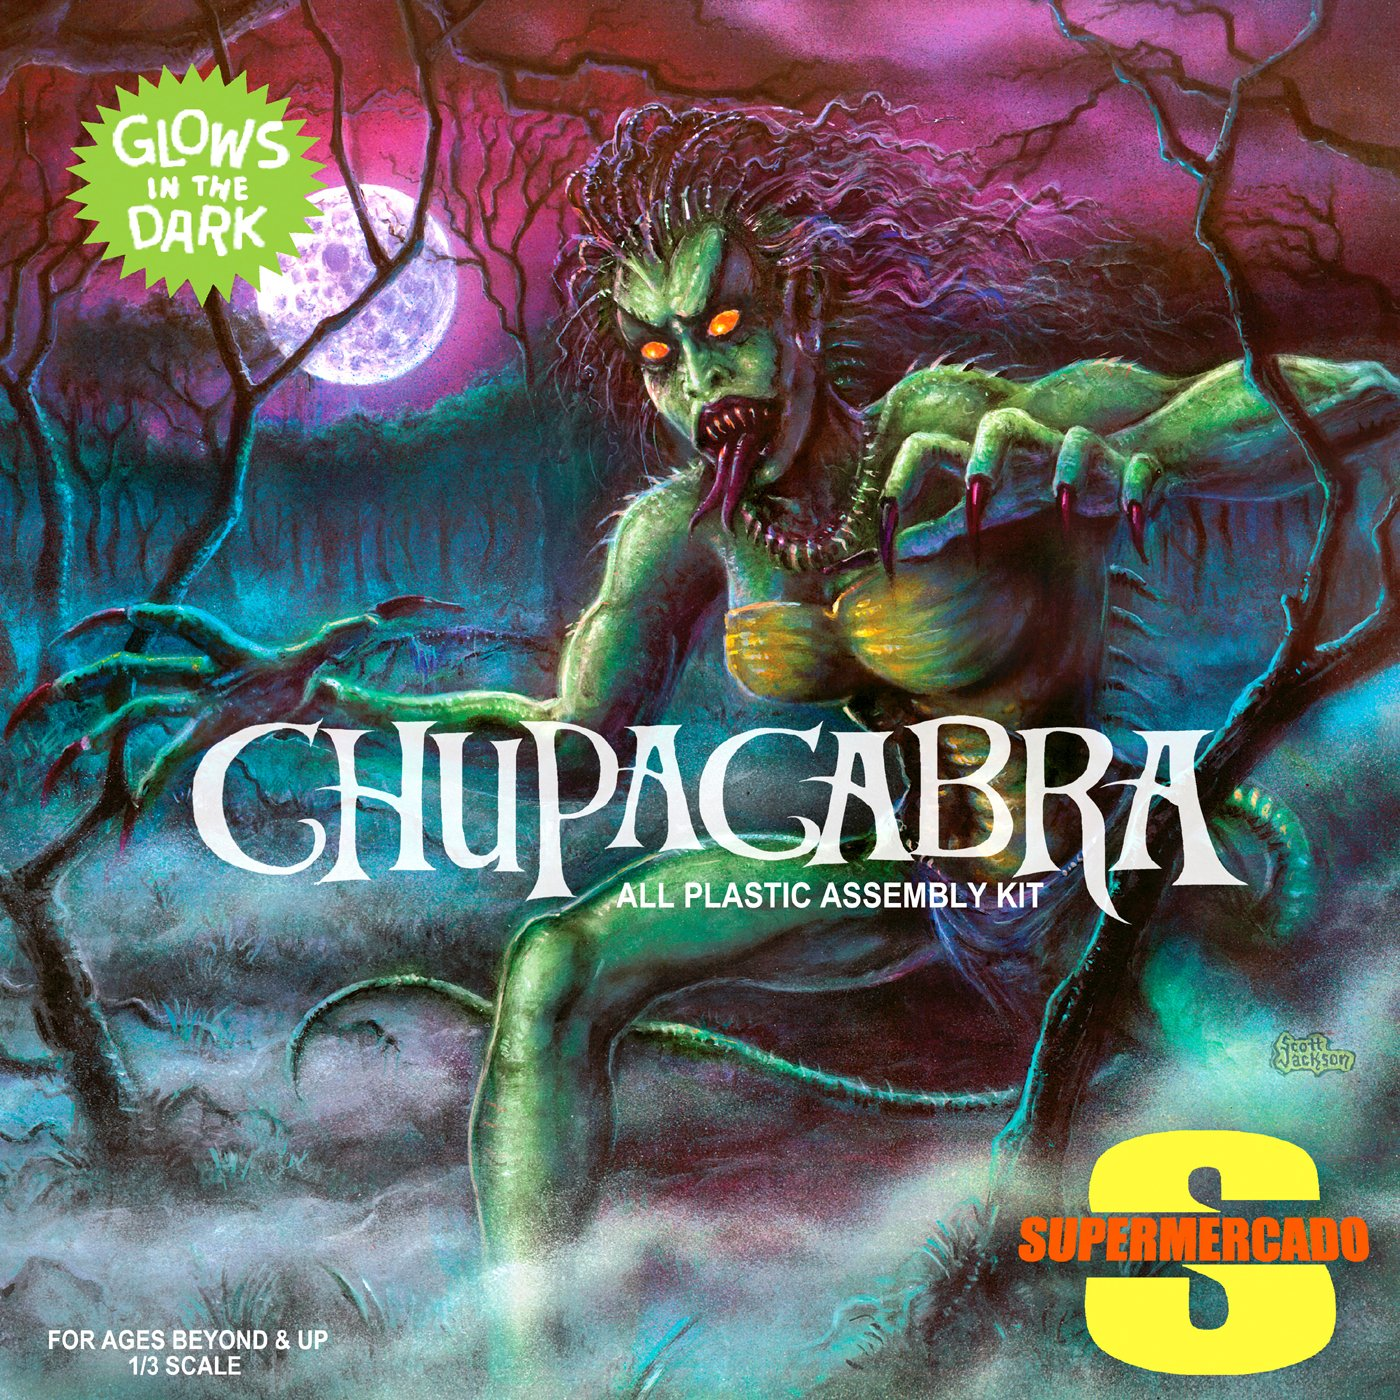 Chupacabra by Supermercado USB Wristband